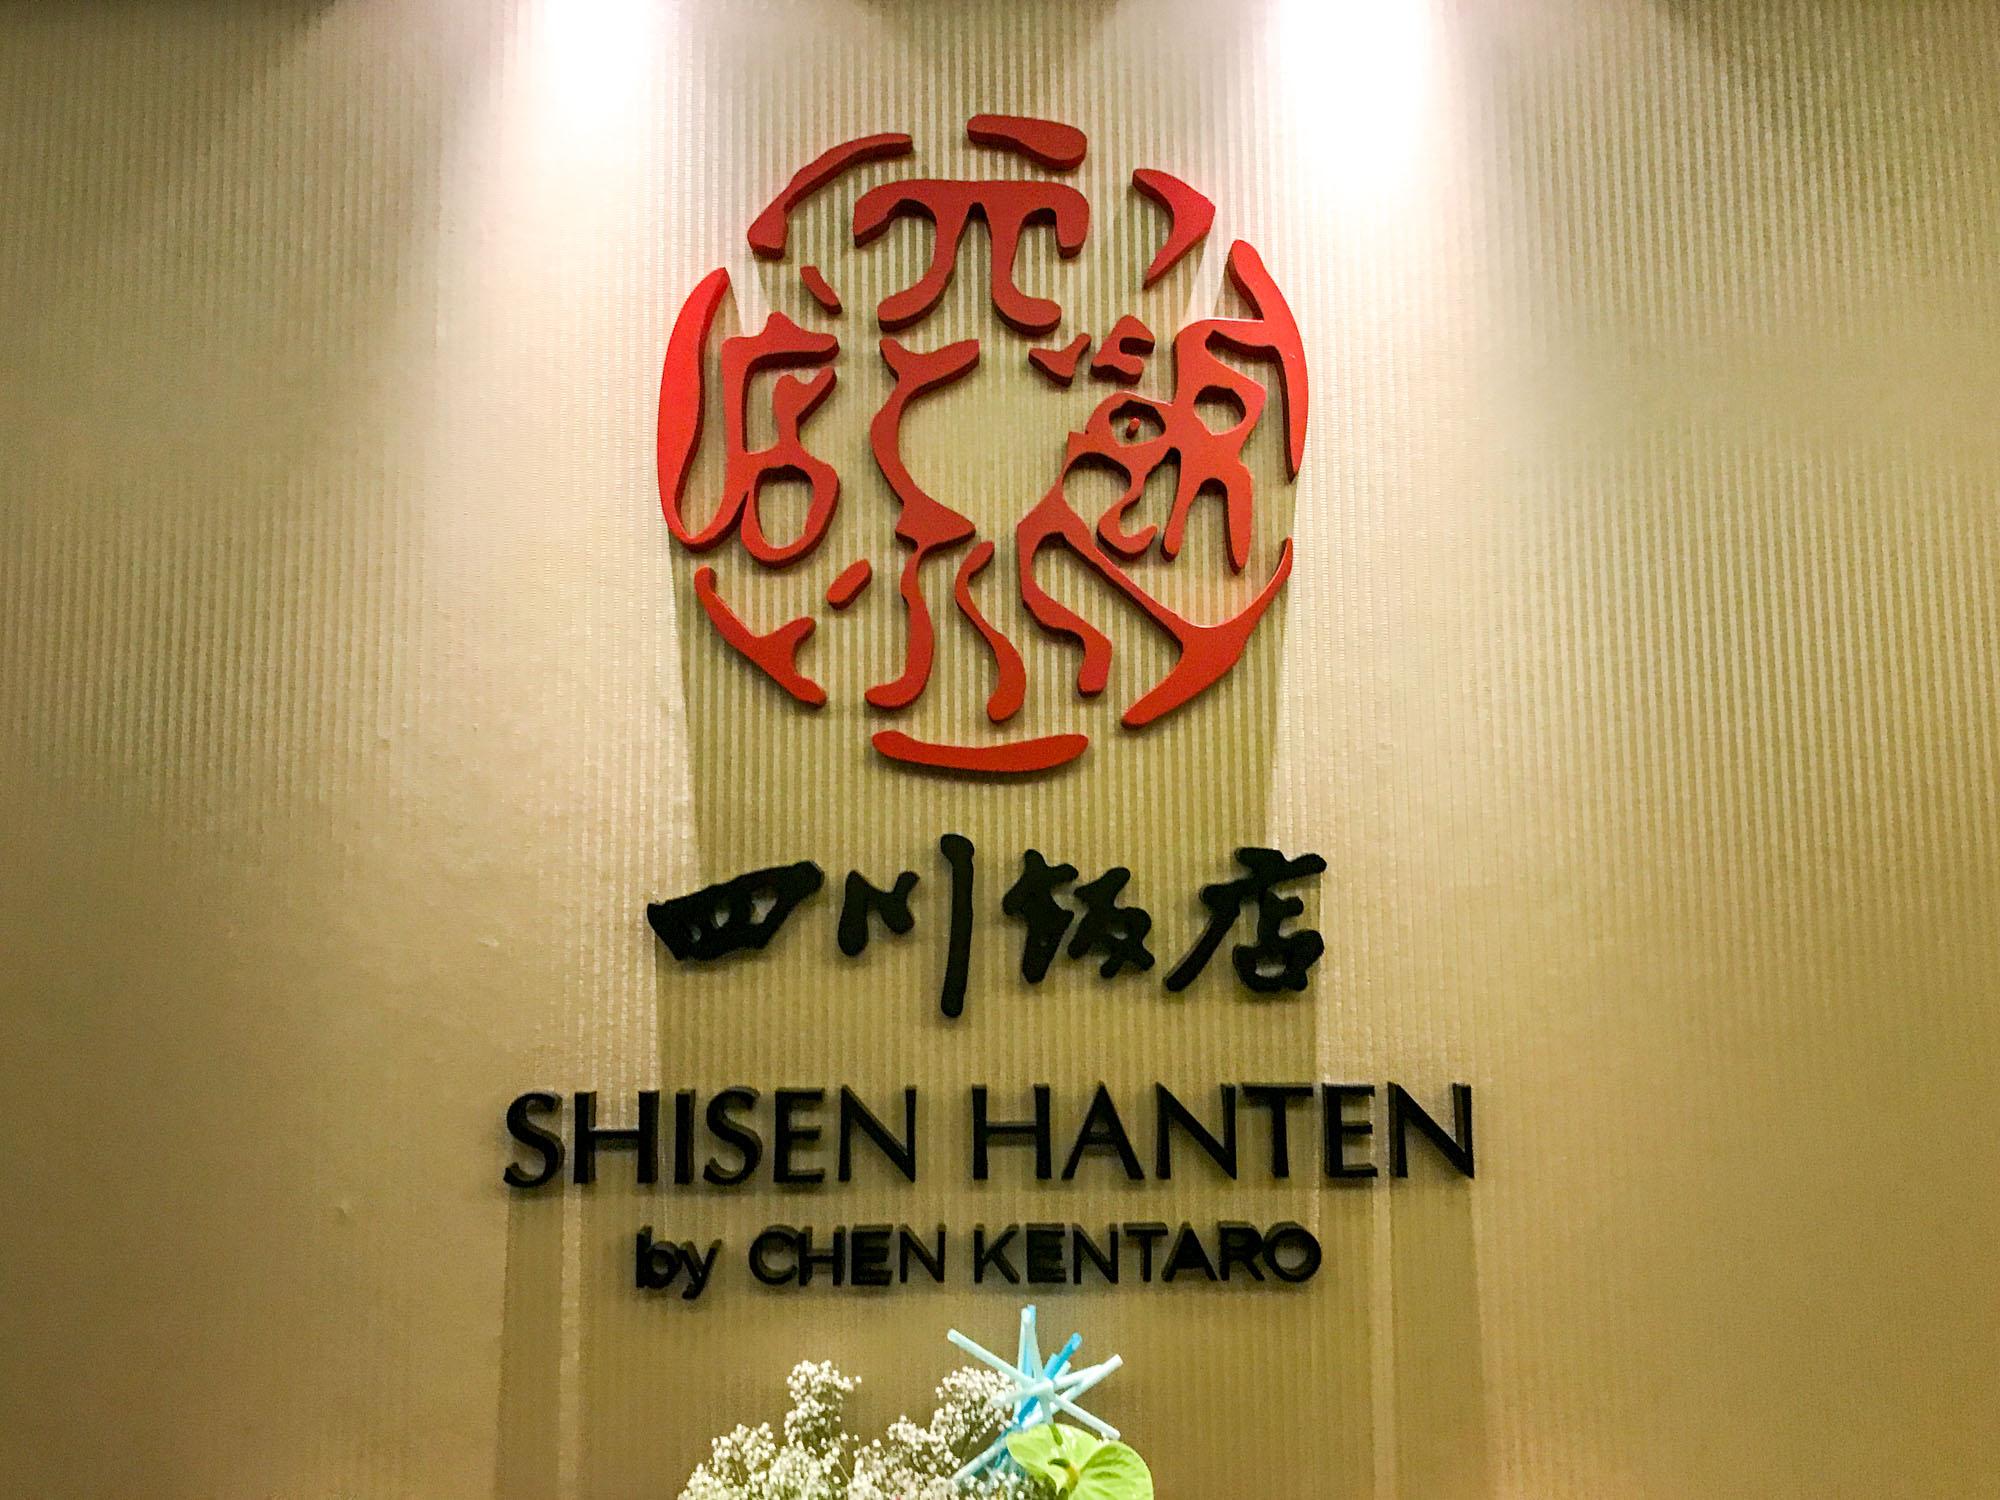 shisen-hanten-mandarin-orchard-darrenbloggie-12